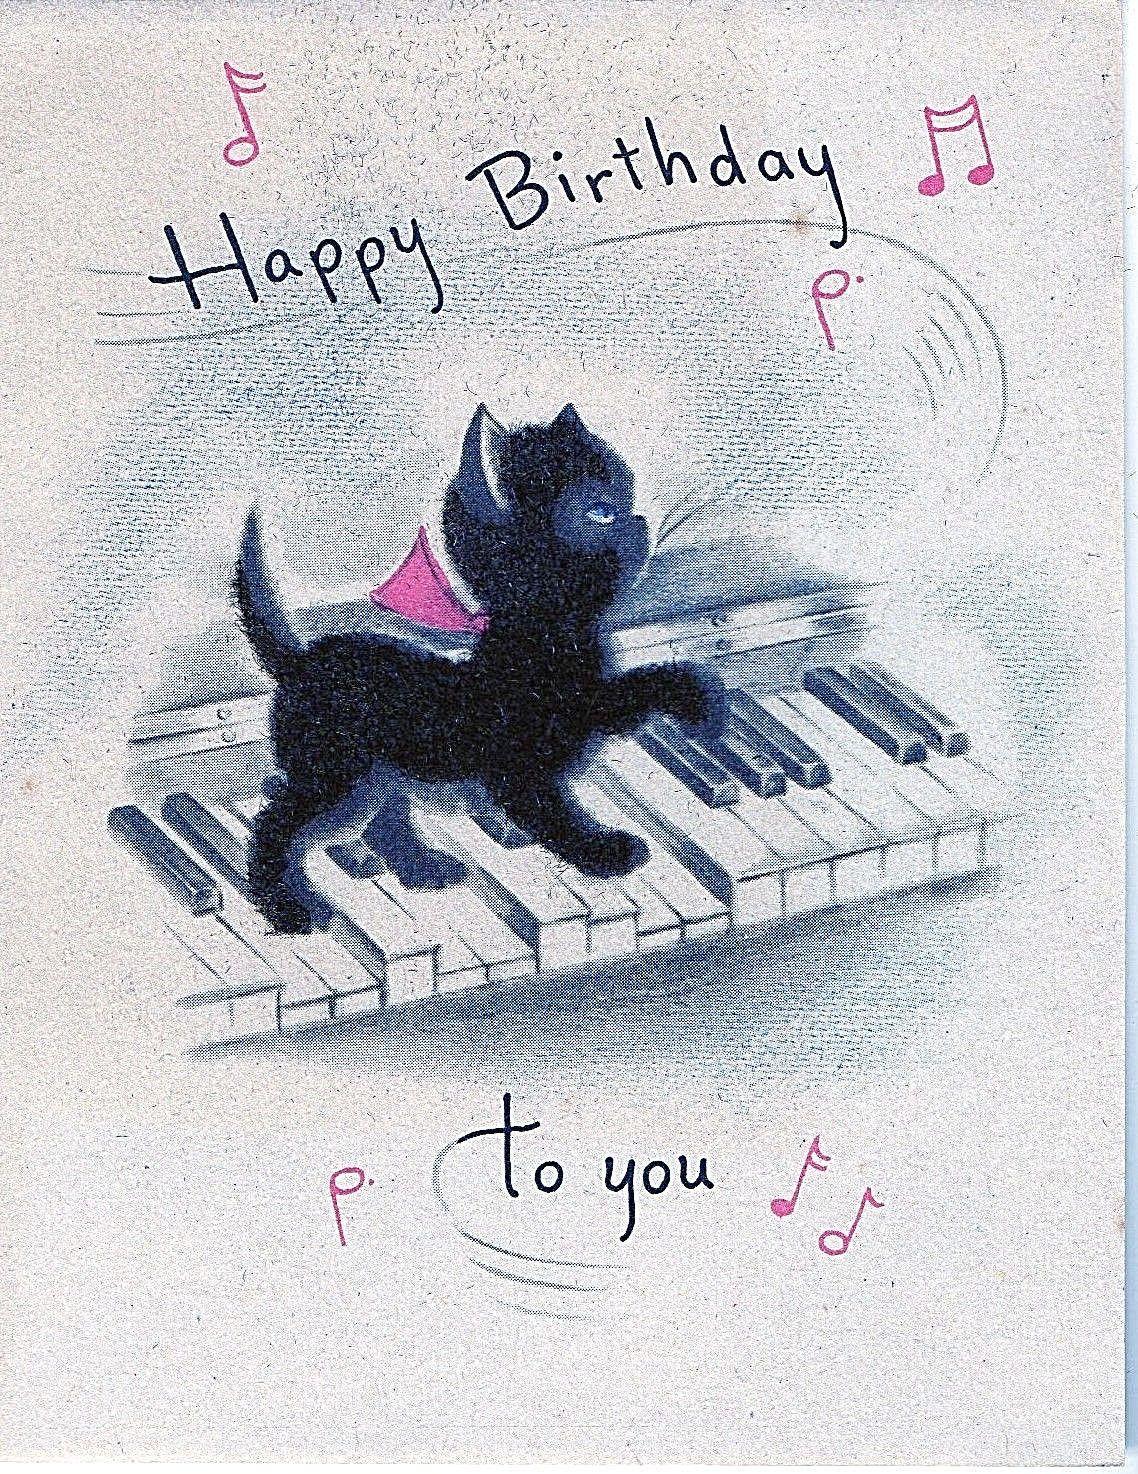 Vintage Black Fuzzy Kitten Kitty Cat On The Keys Norcross Birthday Greeting Card For Sale 6 Vintage Birthday Cards Birthday Greeting Cards Vintage Birthday